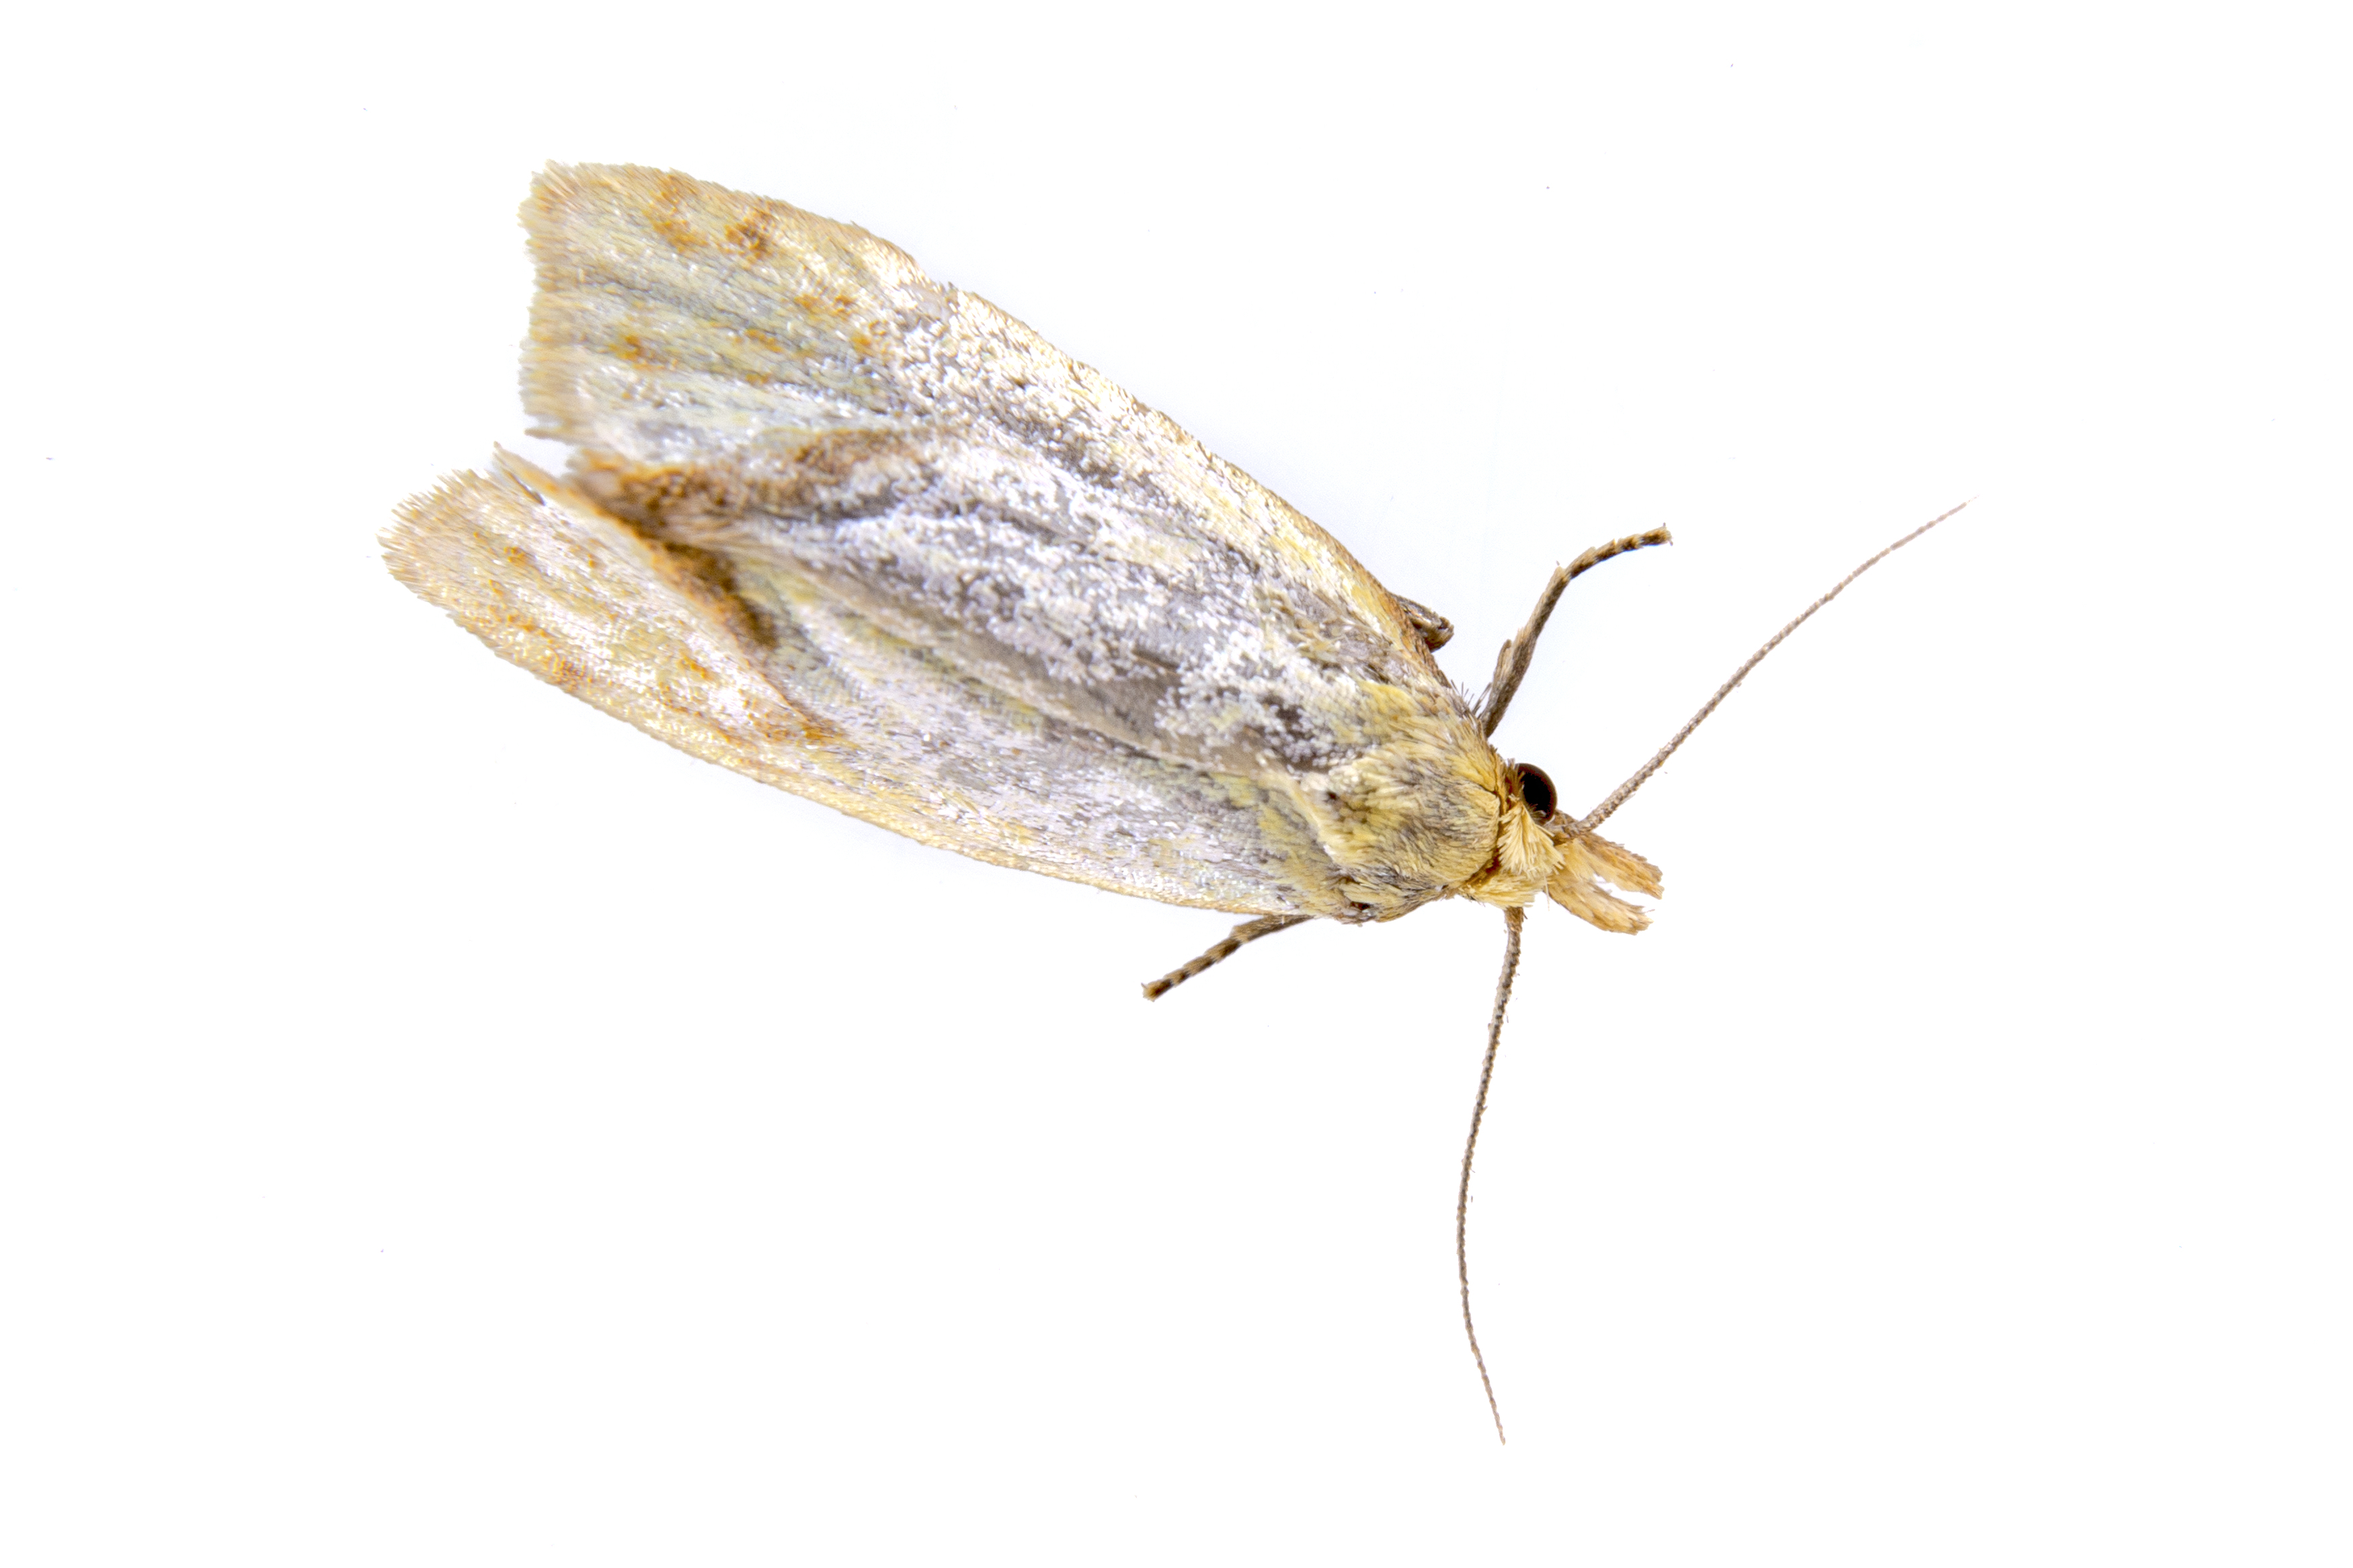 Klædemøl - Tineola bisselliella